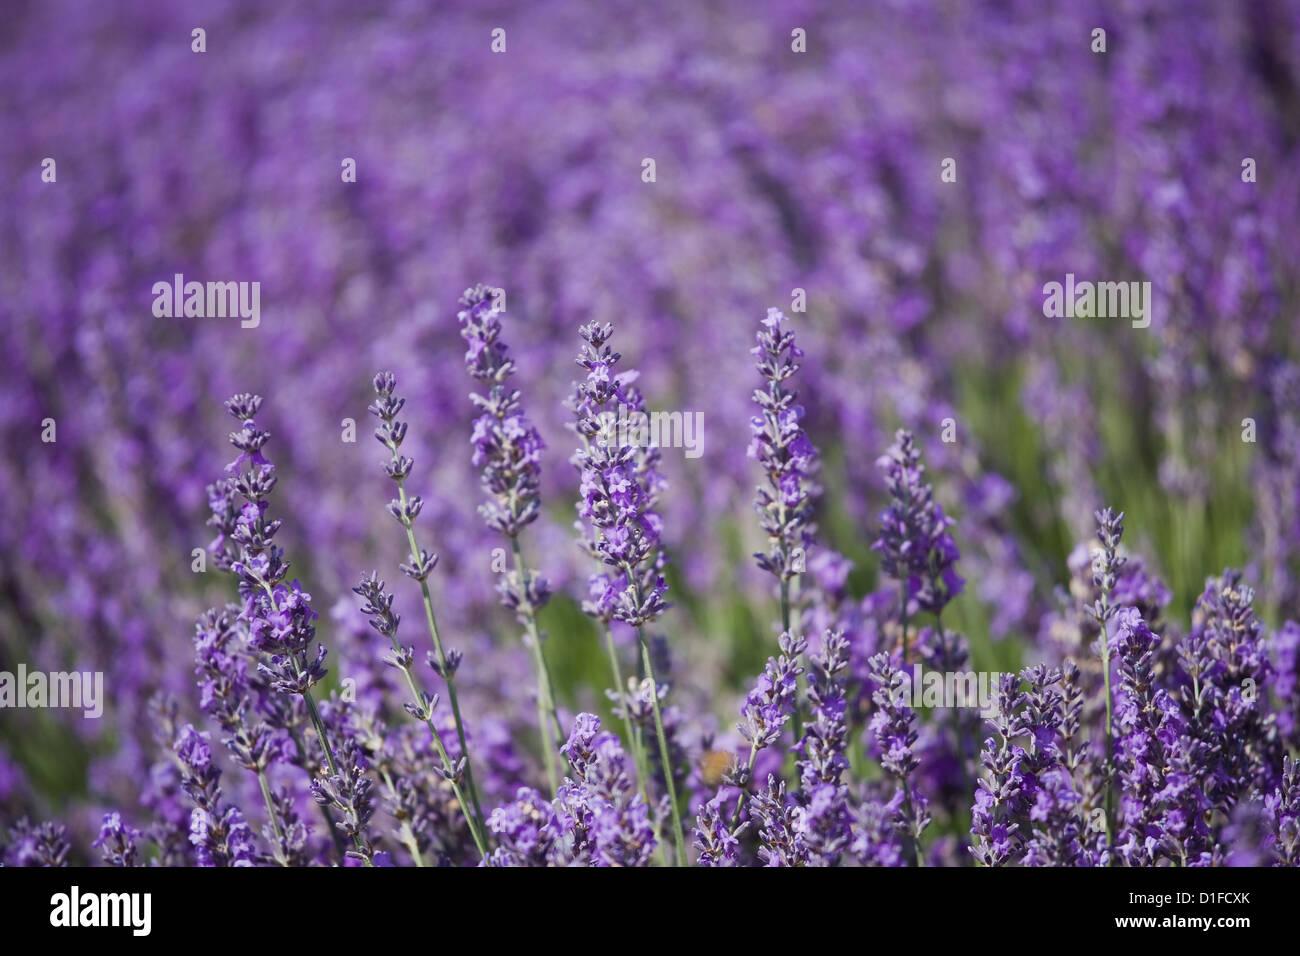 Lavender field, Lordington Lavender Farm, Lordington, West Sussex, England, United Kingdom, Europe - Stock Image